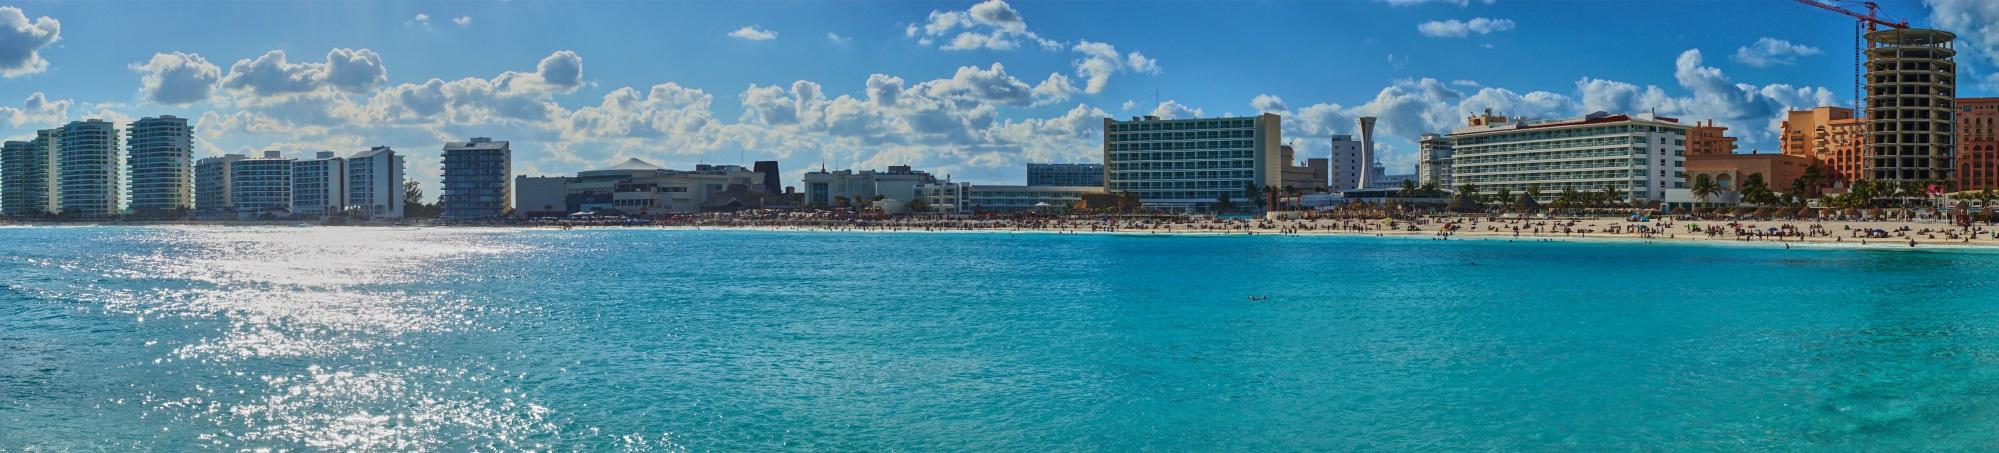 Cancun Panorama